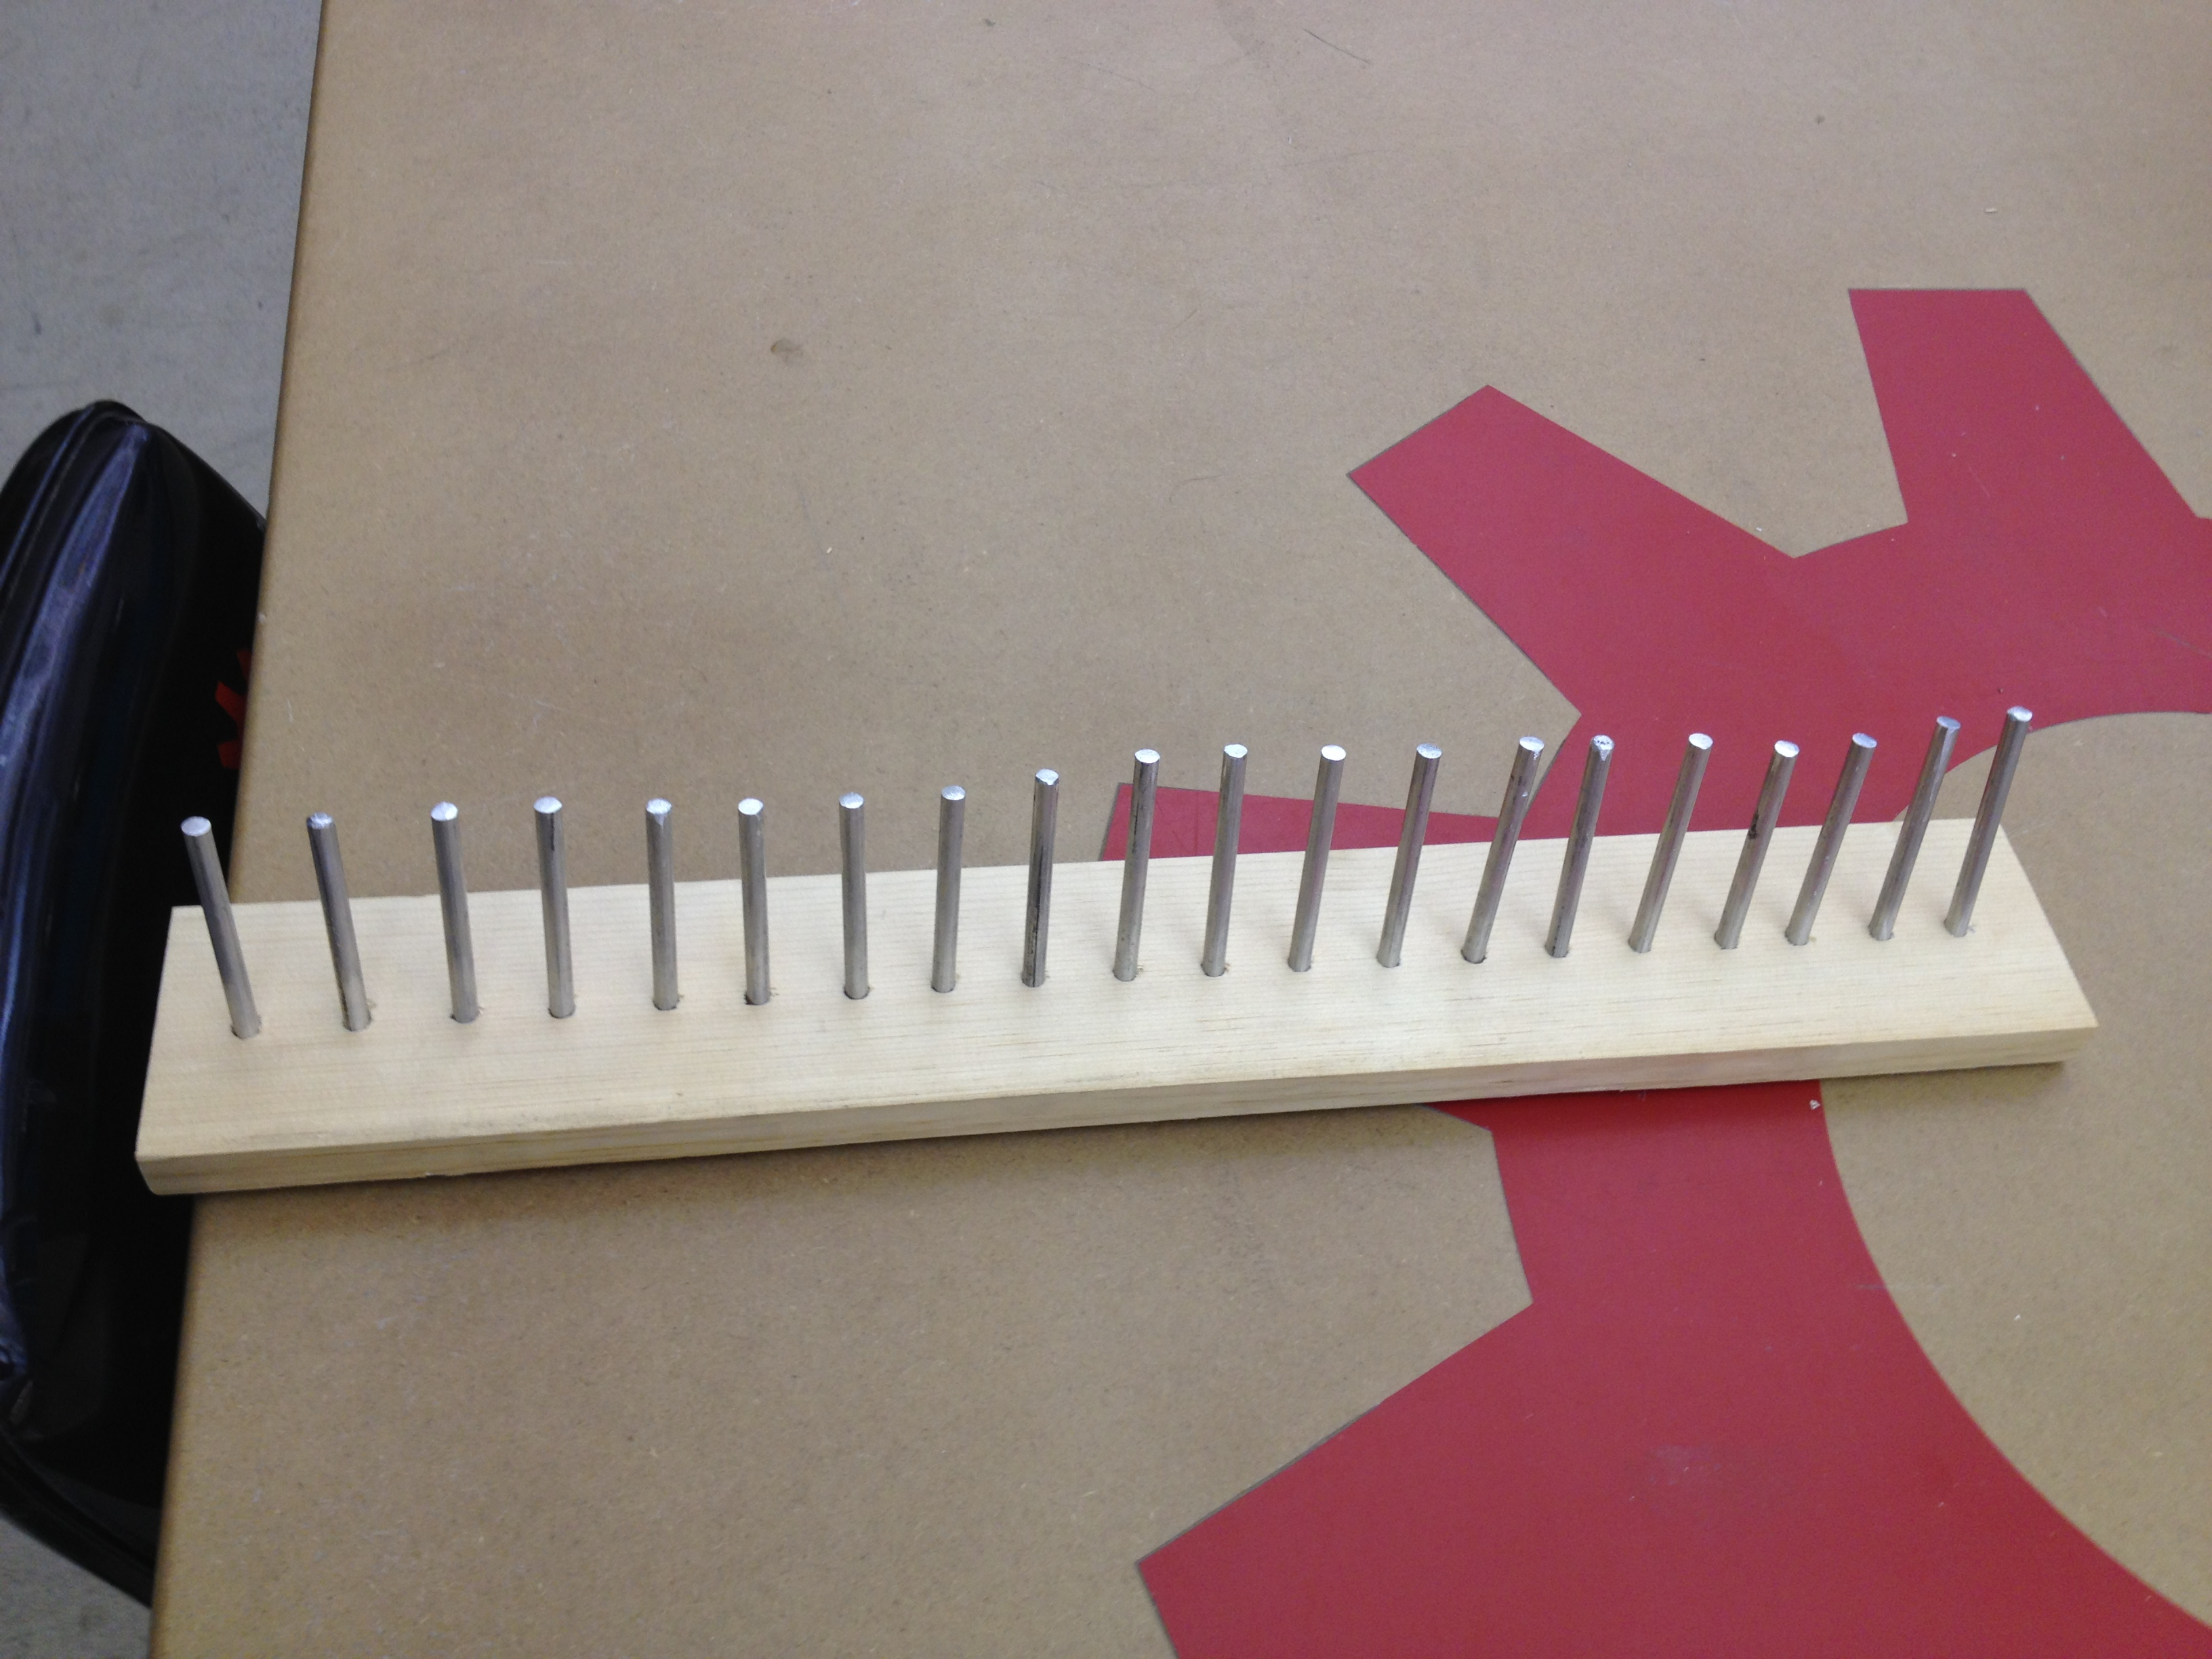 Tie Rack at TechShop